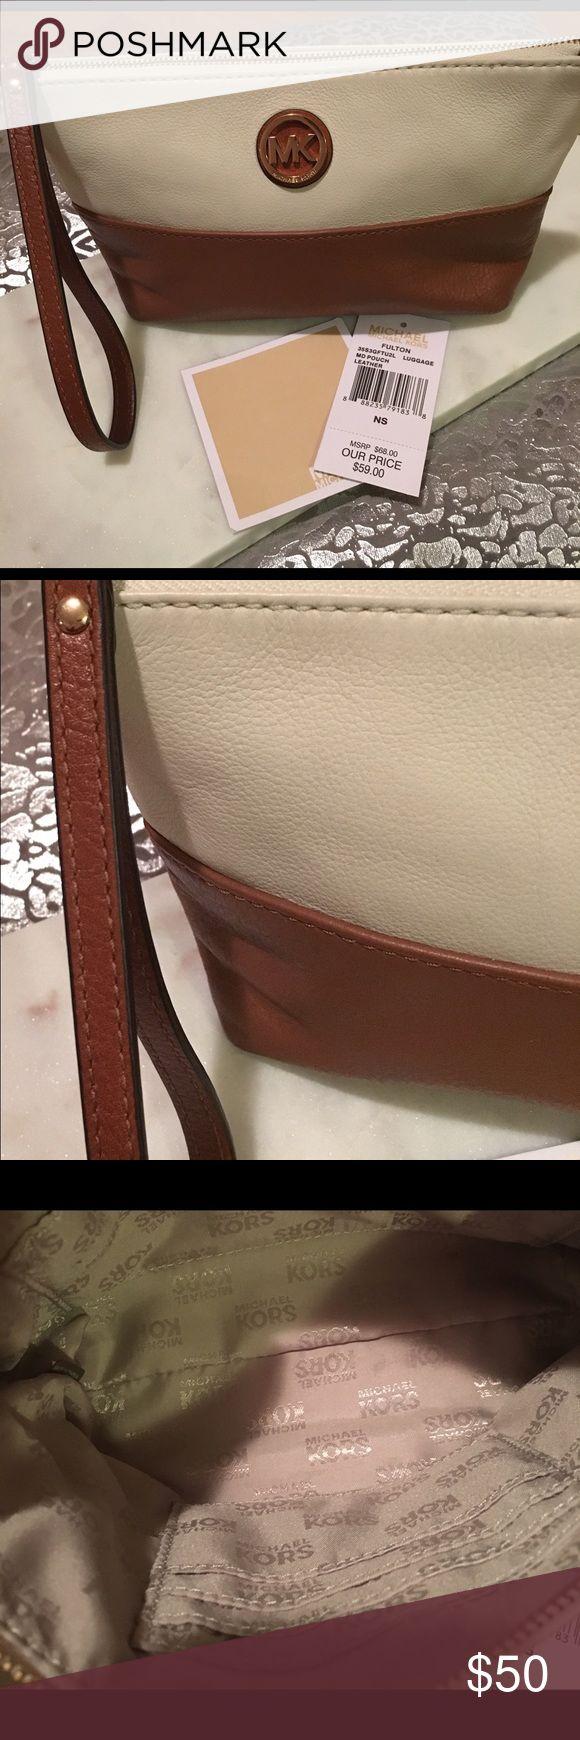 Michael Kors Fulton luggage leather wristlet. Michael Kors Fulton luggage leather wristlet. Michael Kors Bags Clutches & Wristlets